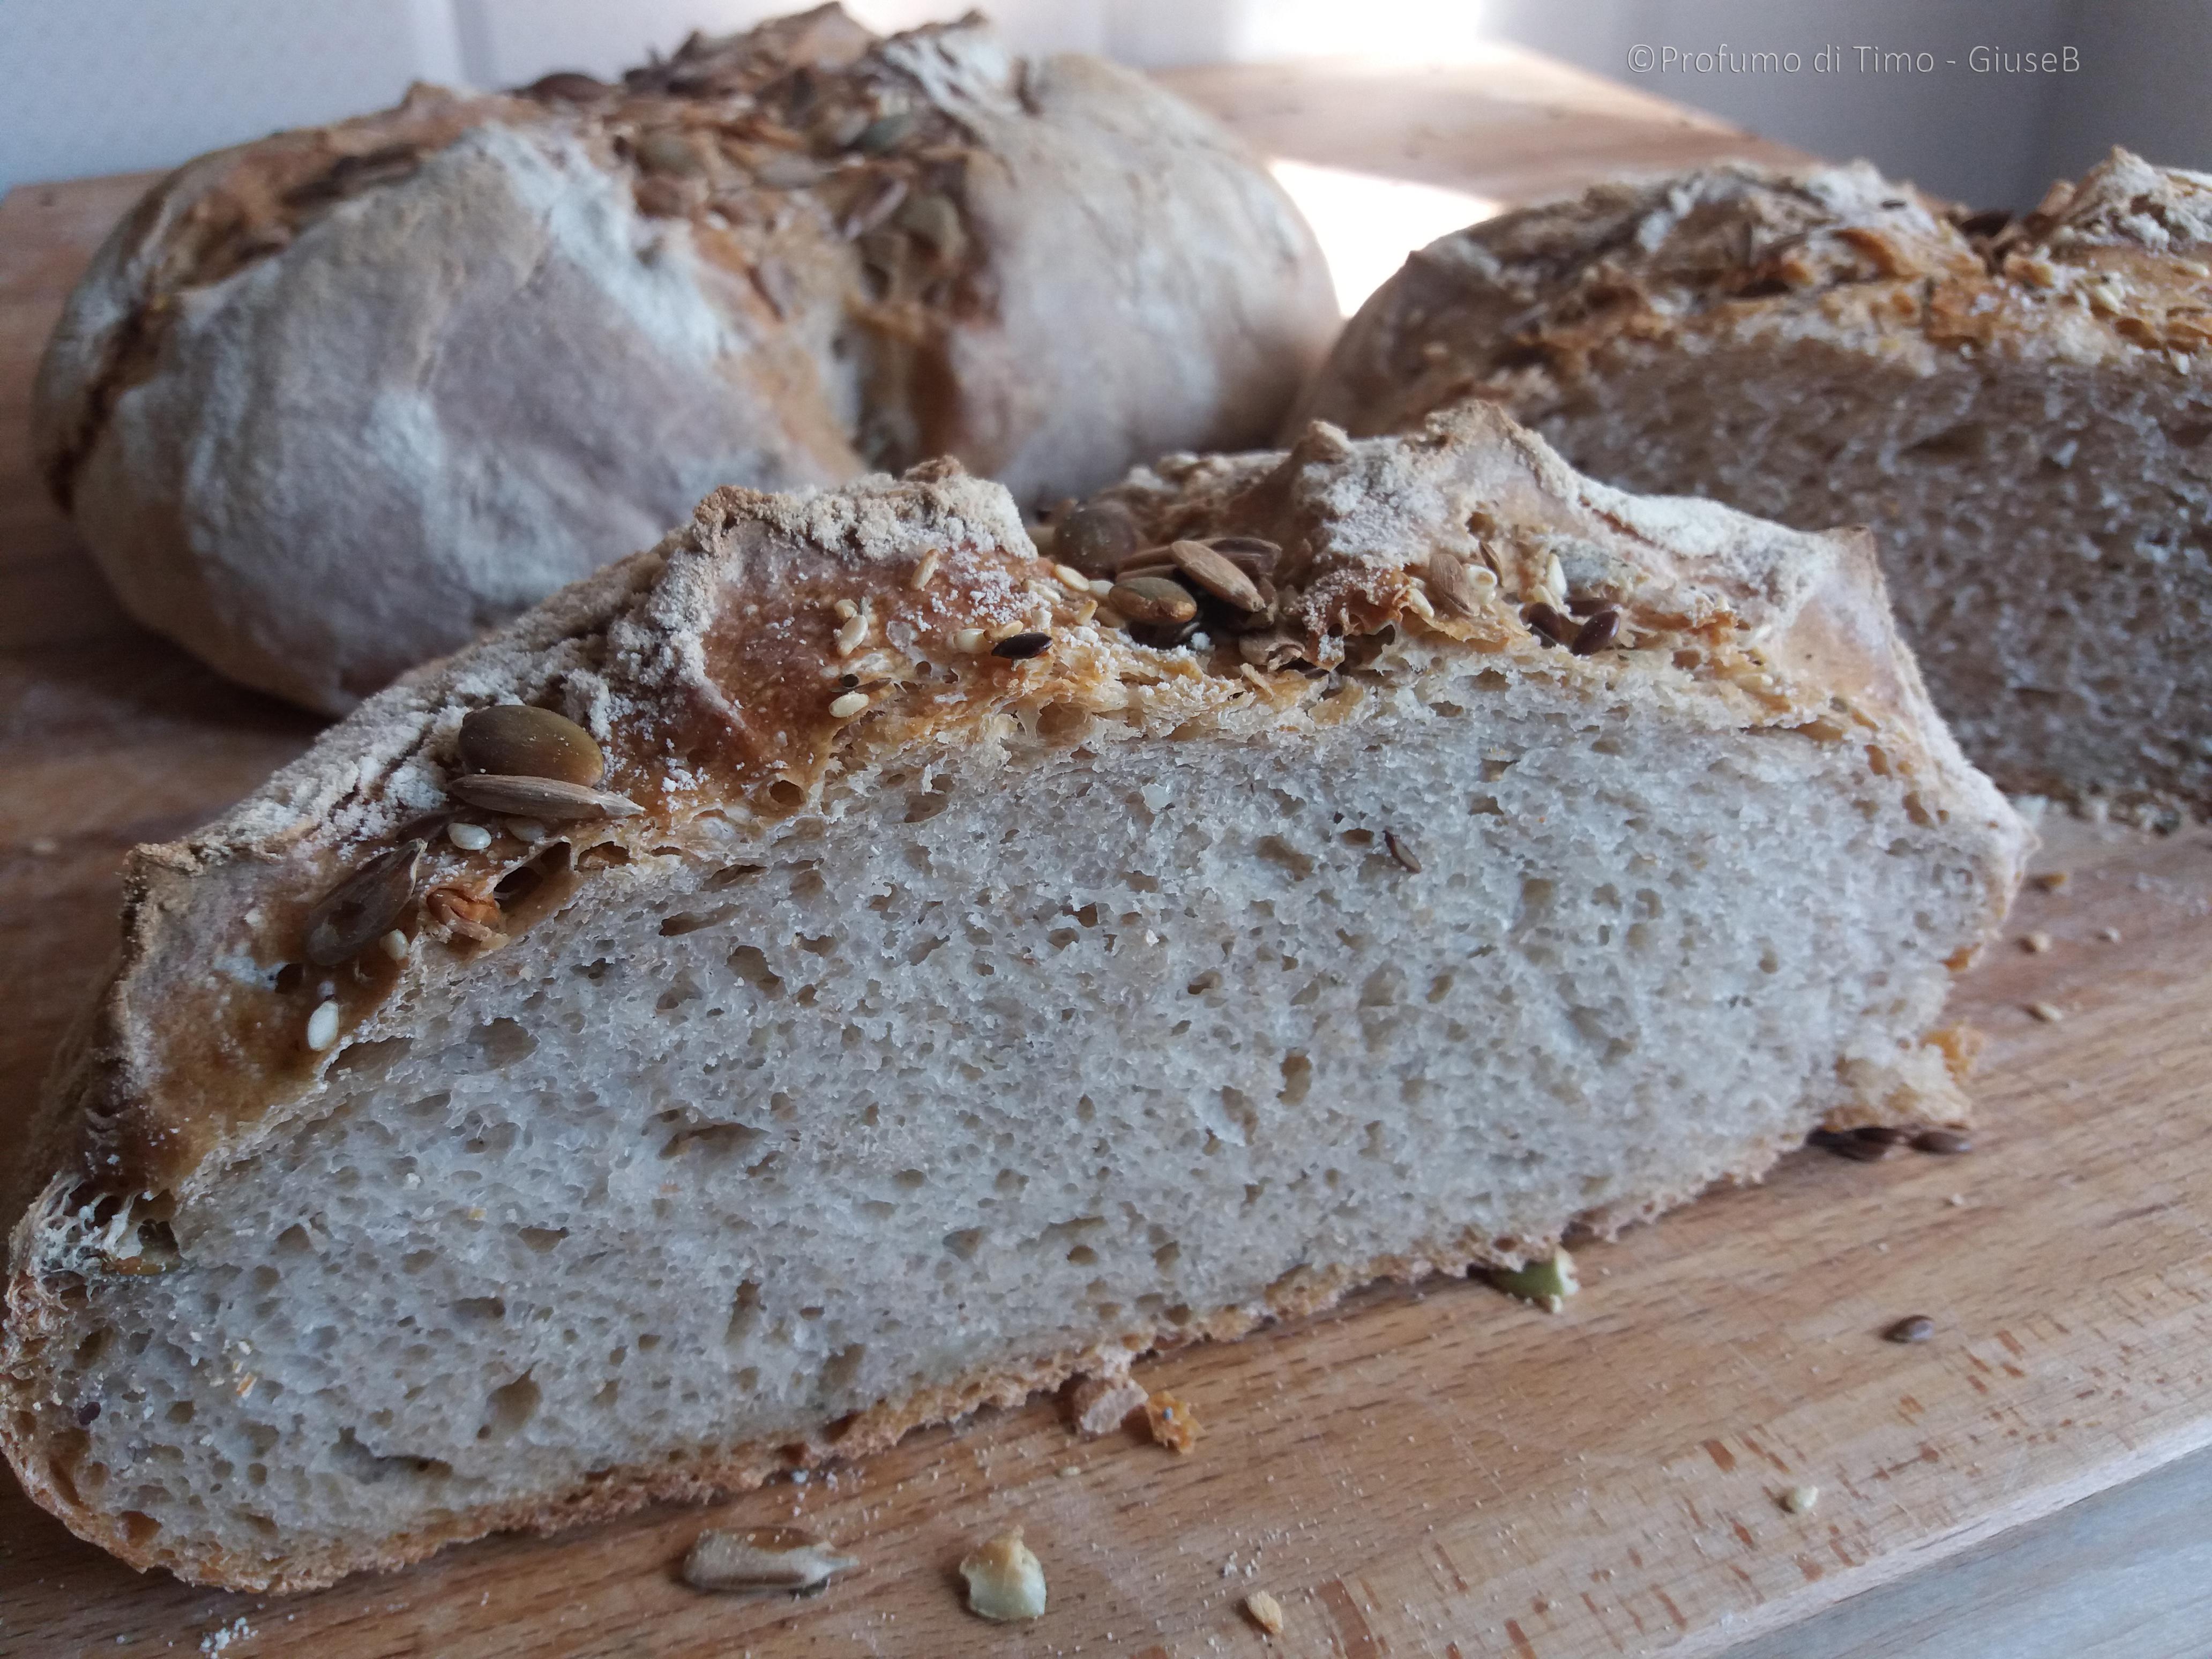 pane-semiintegrale-con-mix-mediterraneo-bio-nuovaterra